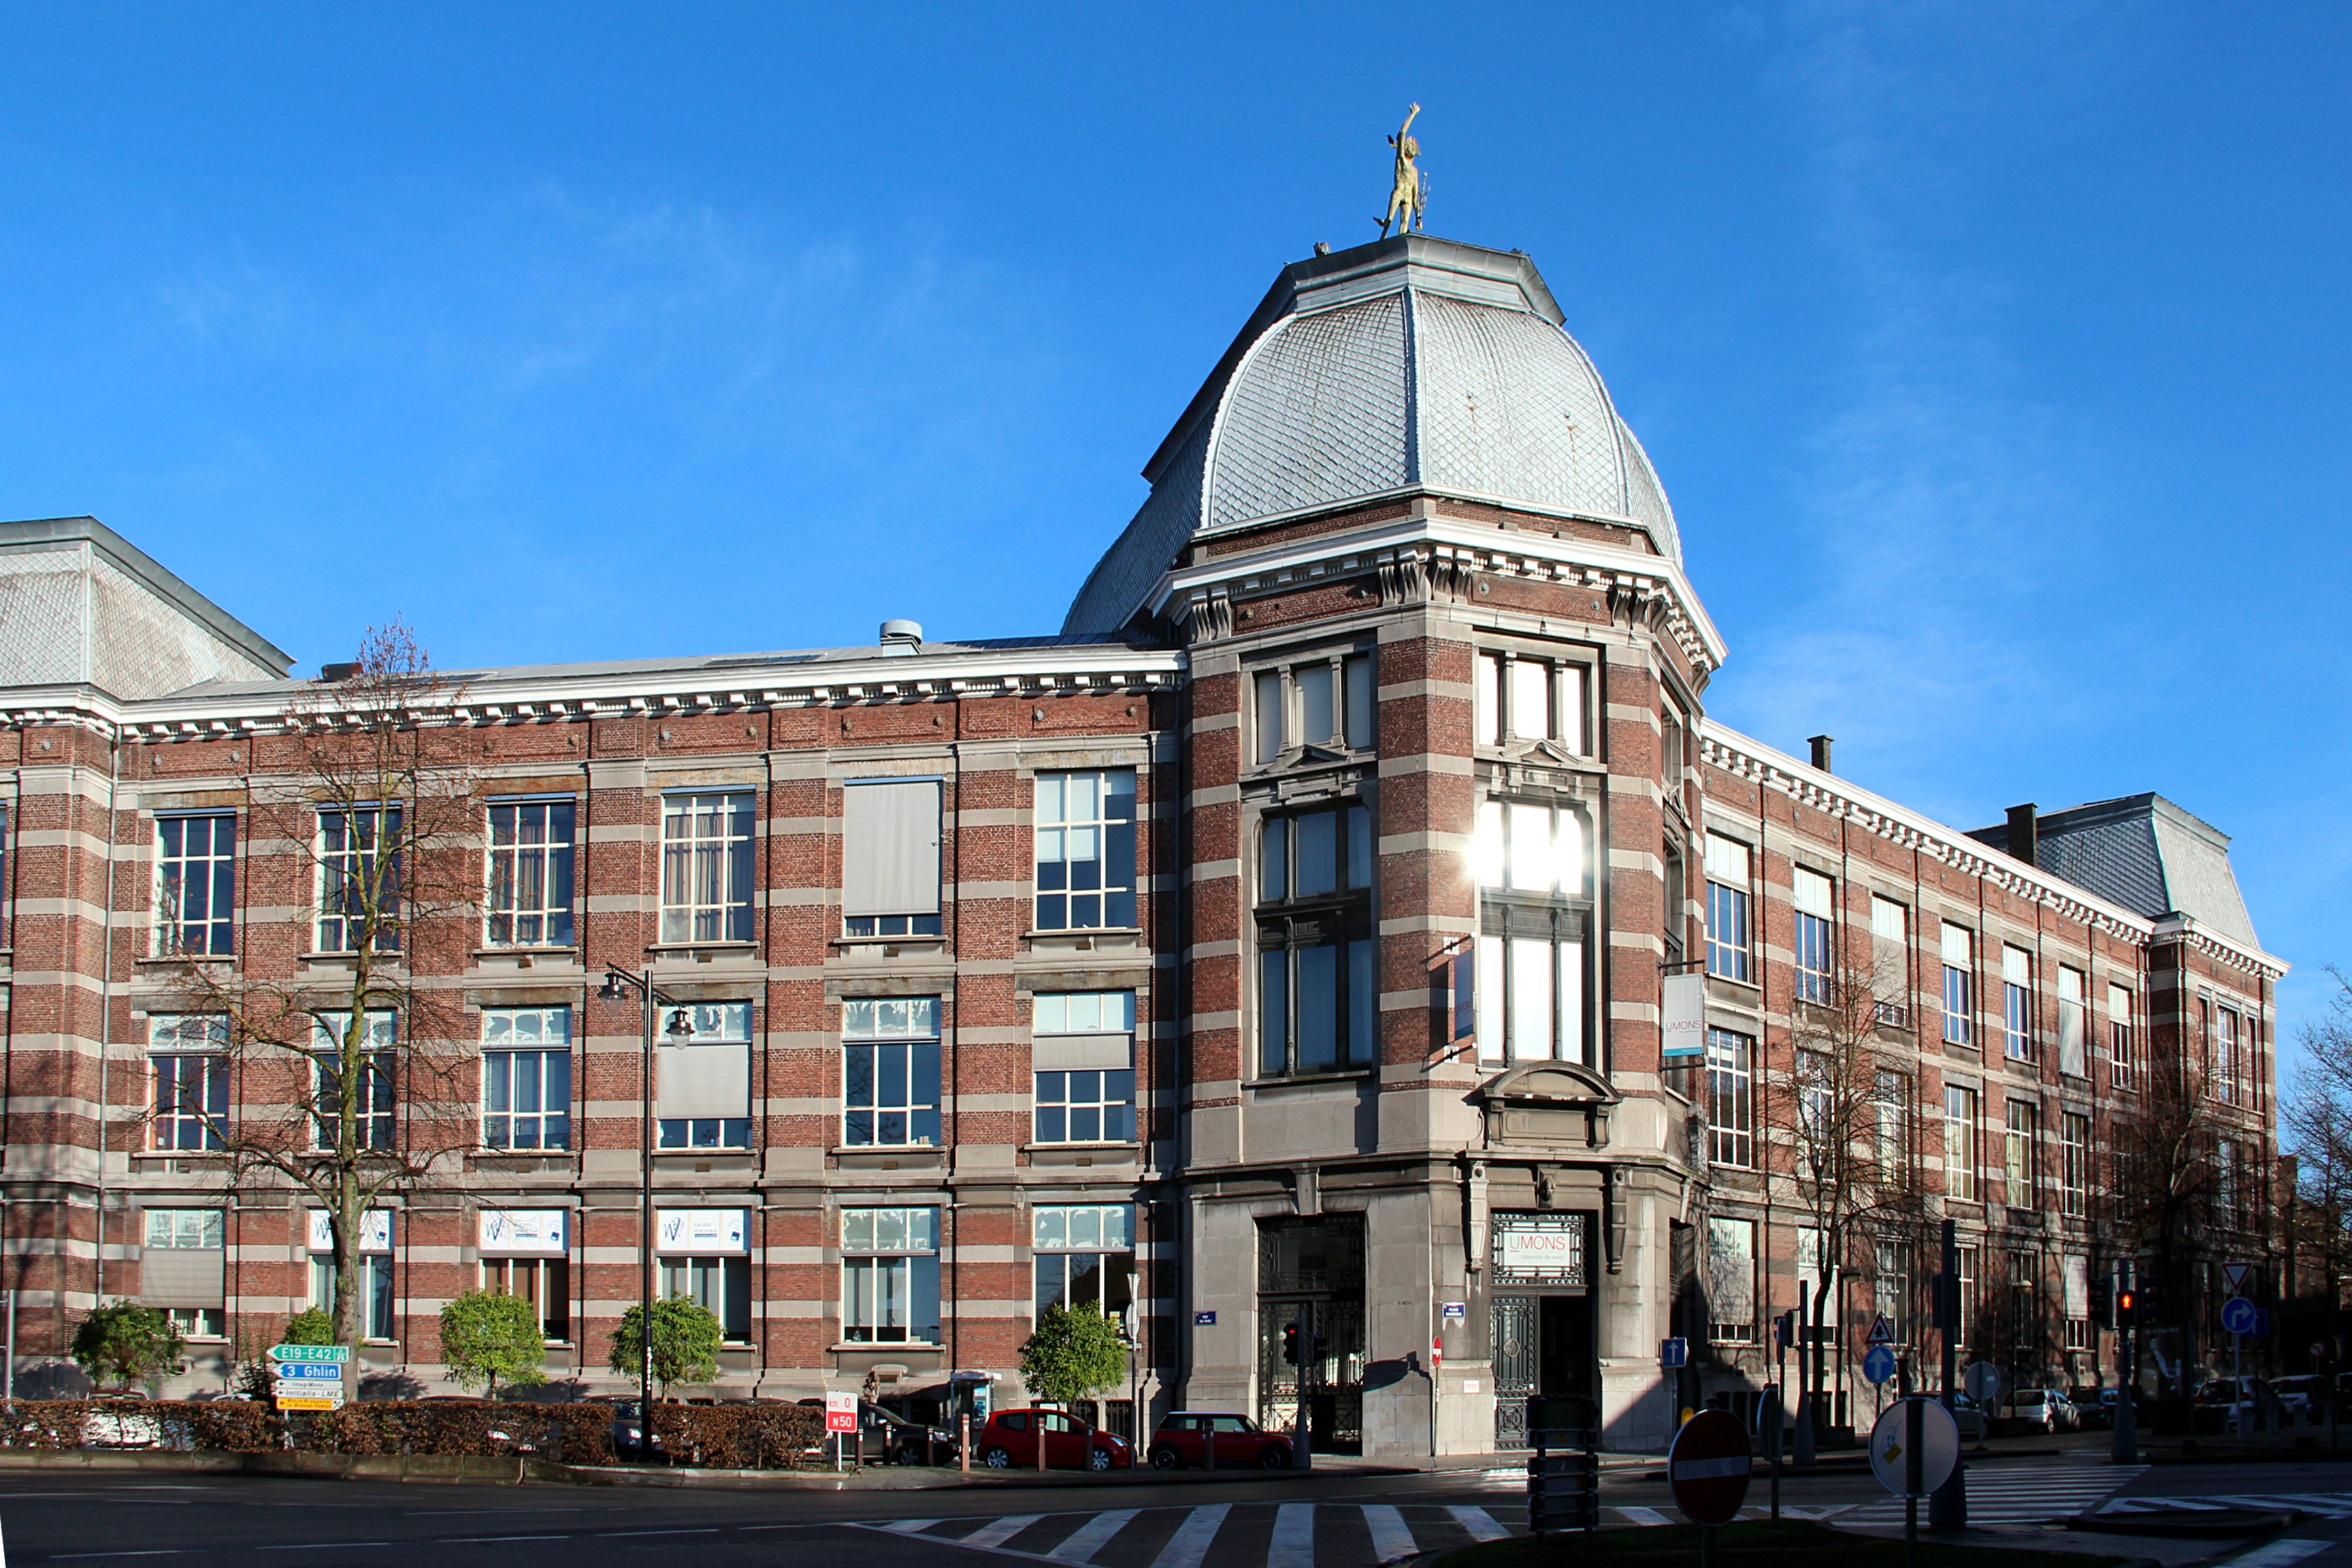 University of mons hainaut wikipedia